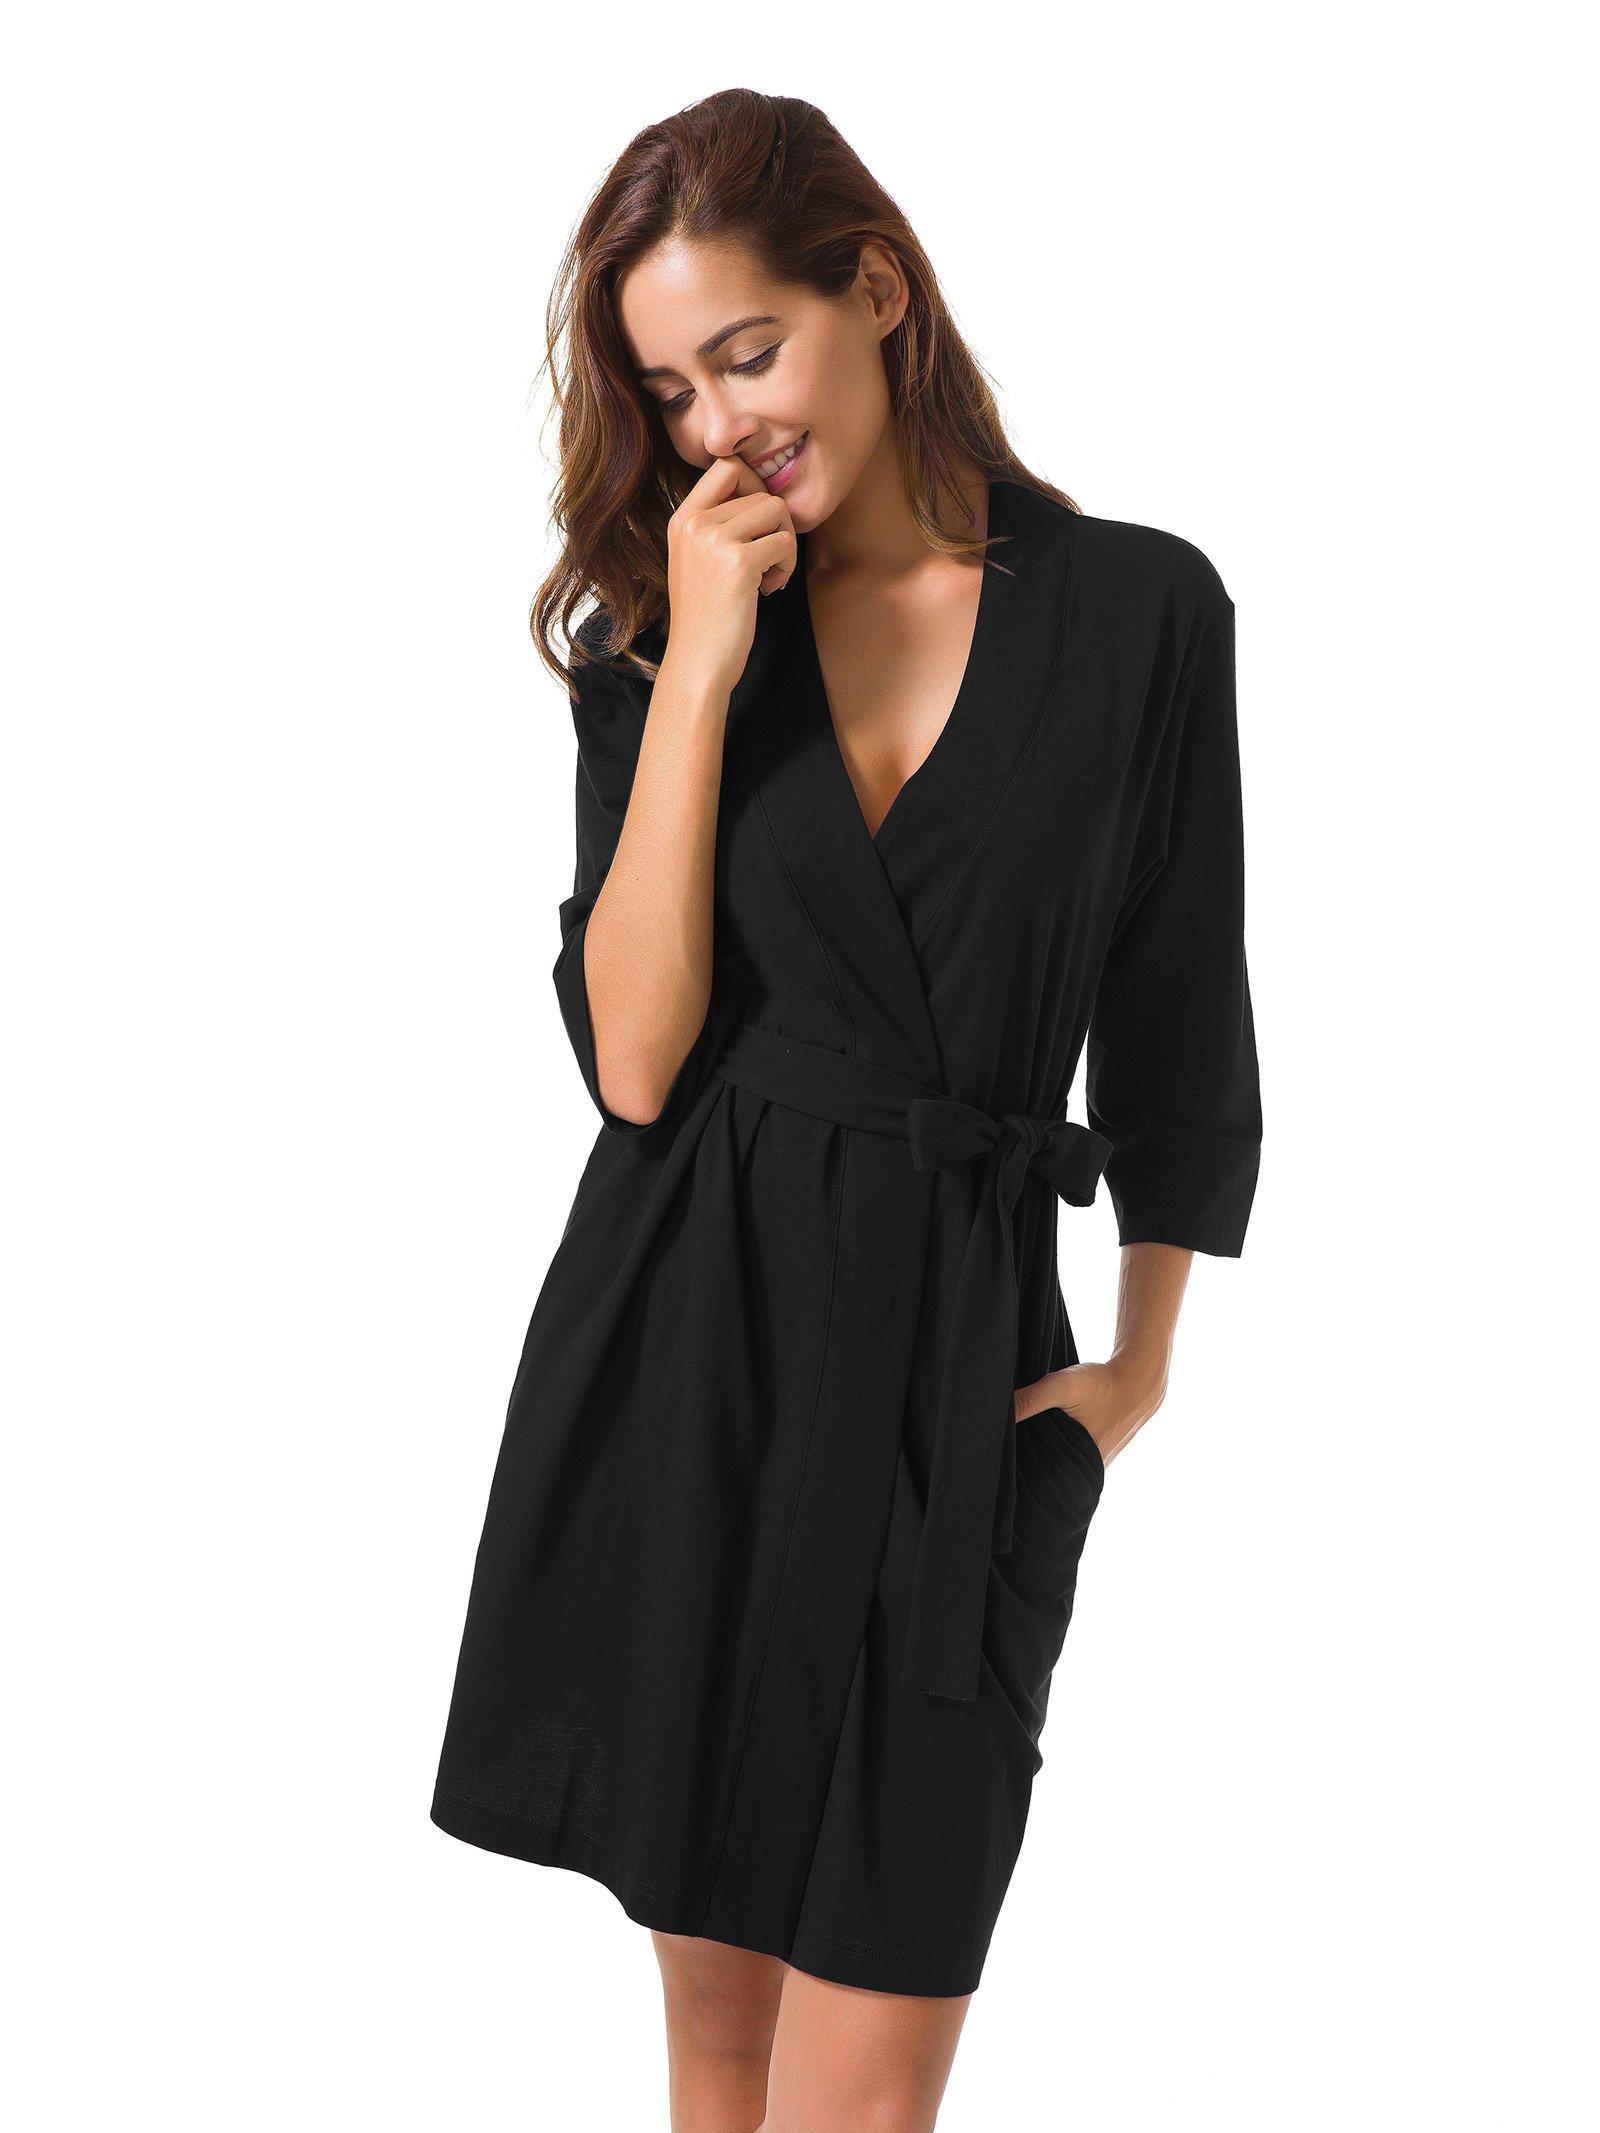 SIORO Cotton Robes Lightweight Kimono Robe Gowns Soft Knit Bathrobe Nightwear V-Neck Loungewear Sexy Sleepwear Short for Women, Black, S by SIORO (Image #1)